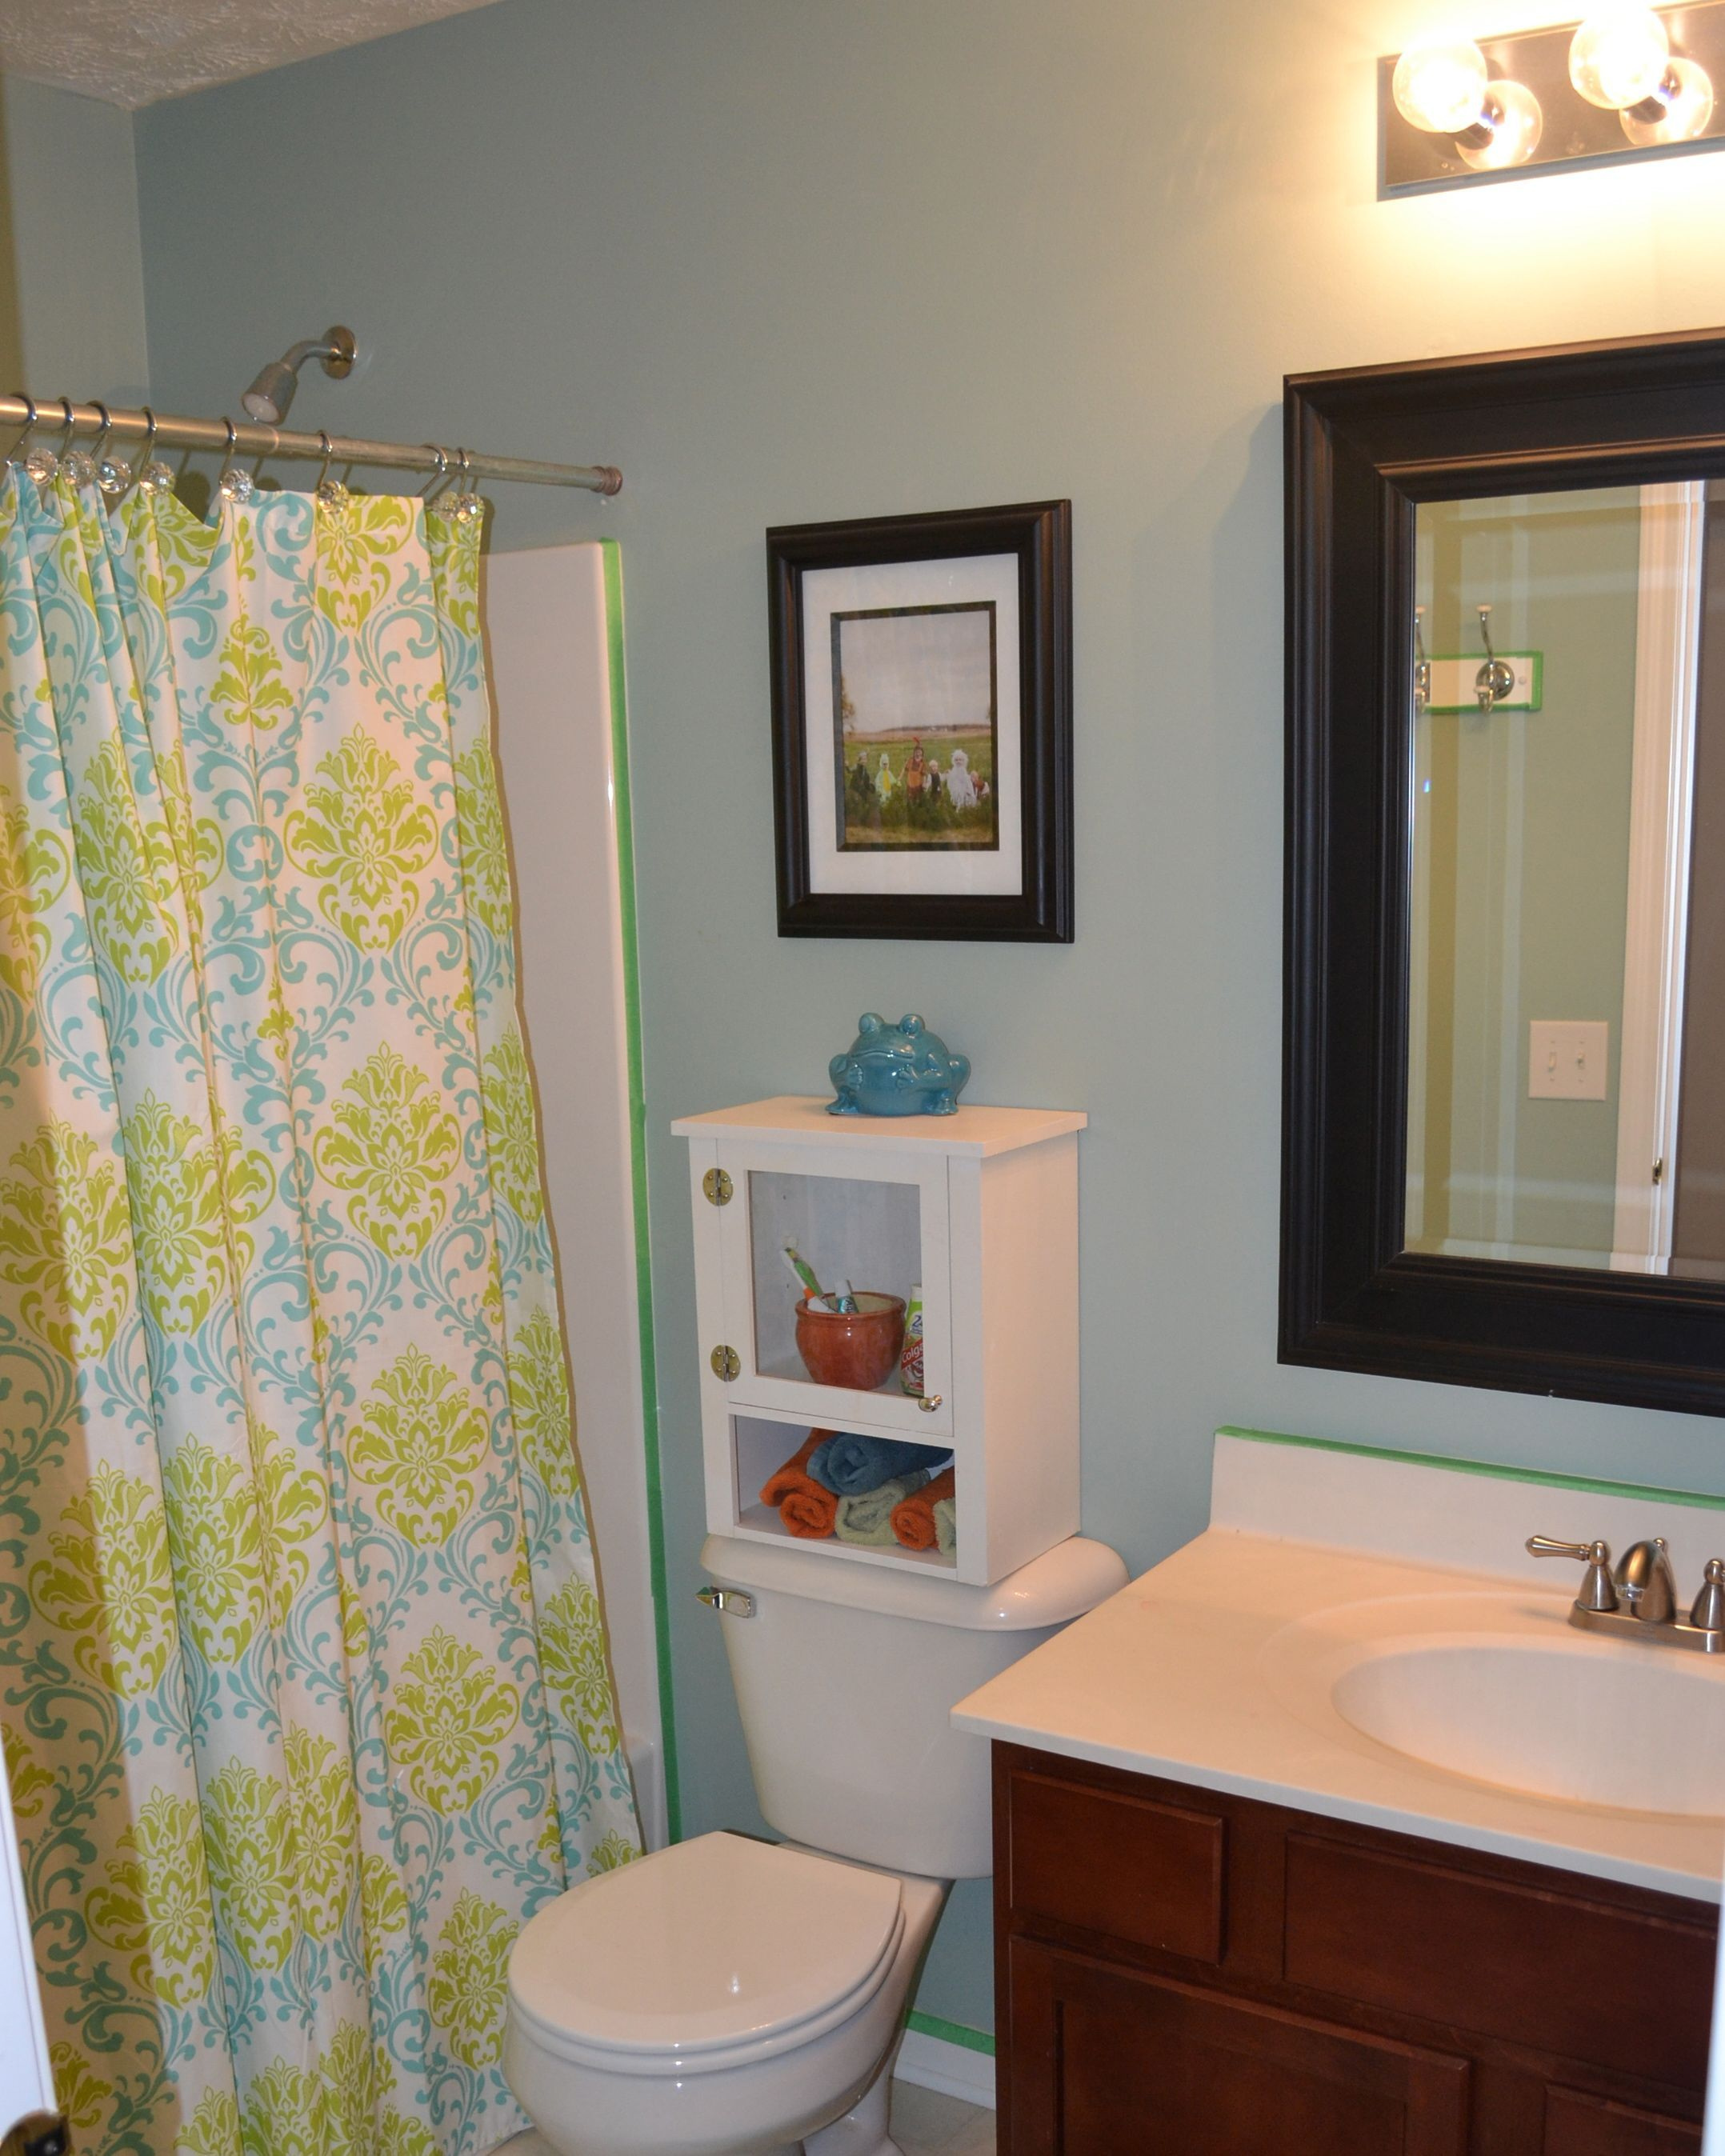 Small Bathroom Mirror Ideas With Modern Blue White Kids Bathroom Shower Curtain Wall Mirror Sink Closet Cabinet Design